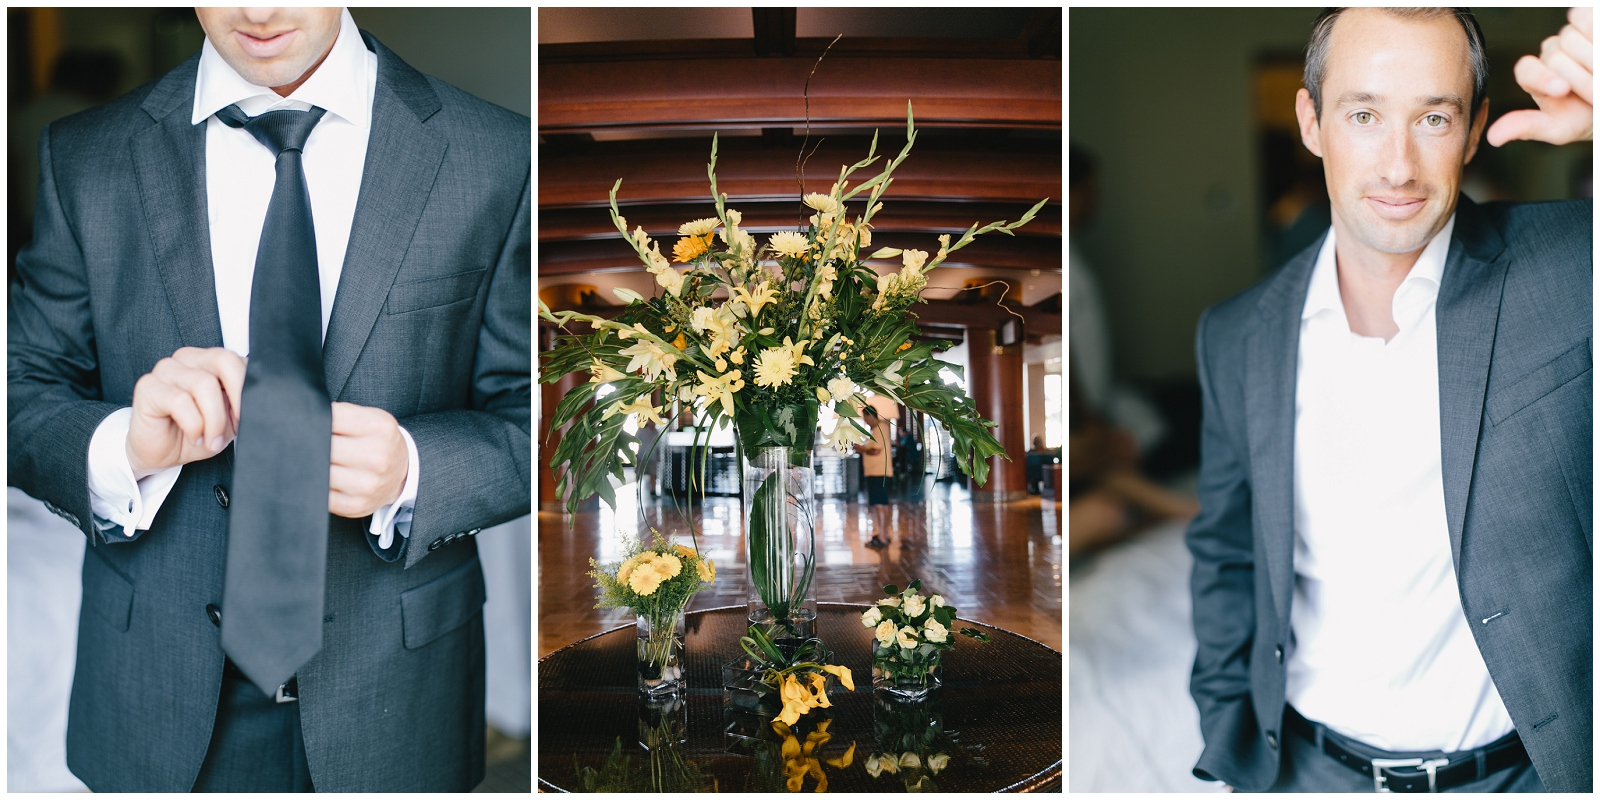 San-Francisco-Bay-Area-Wedding-Photography-Destination-11.jpg